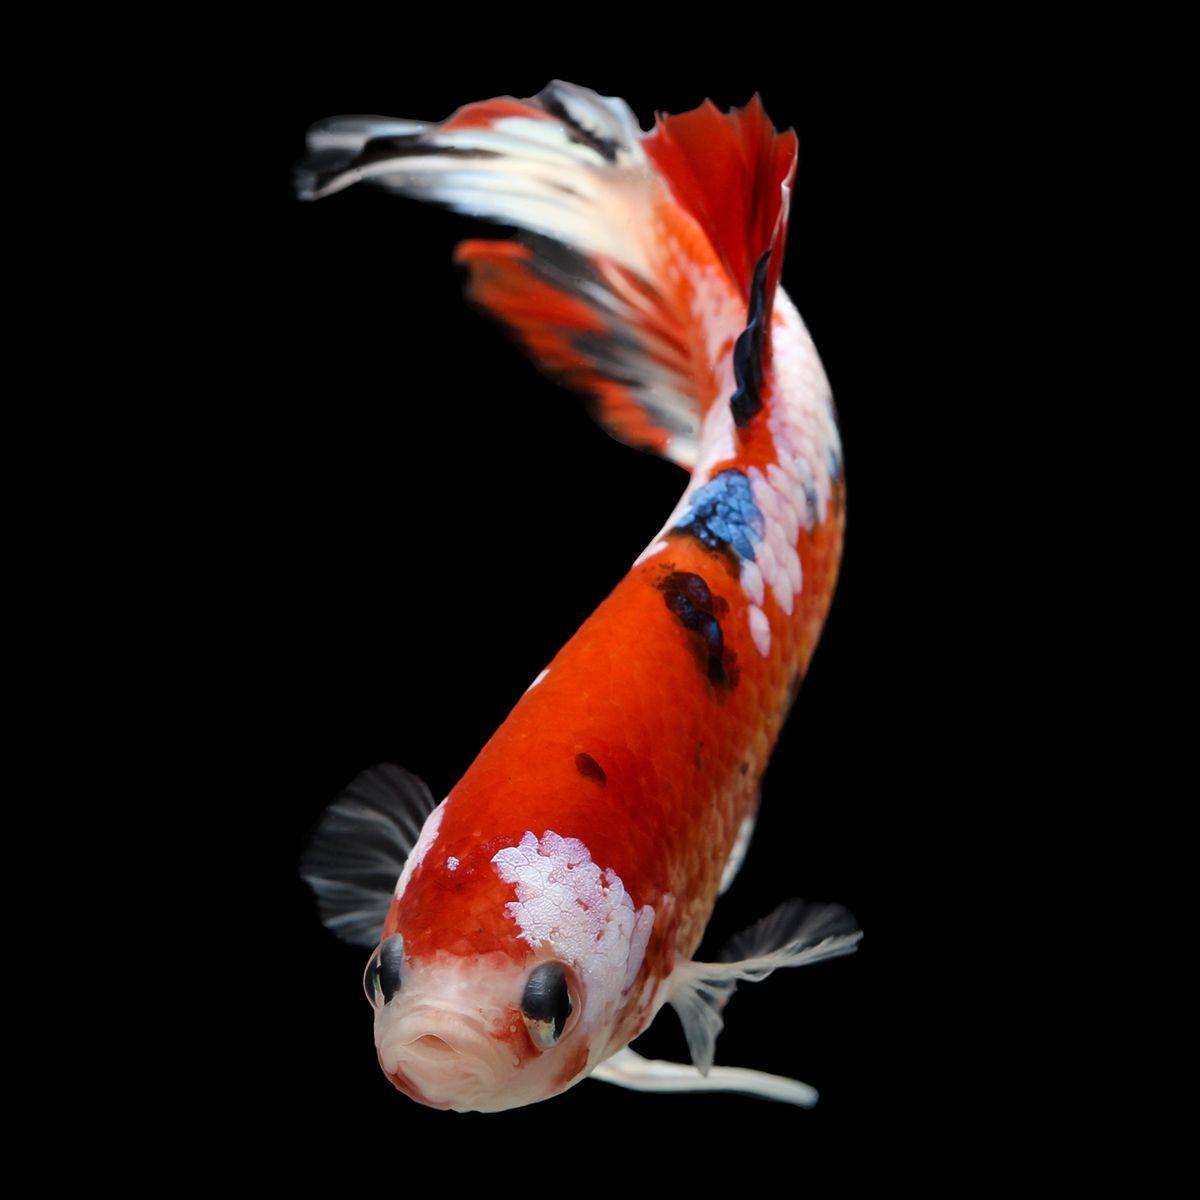 Male koi betta | Small aquarium | Pinterest | Betta, Koi and Betta fish